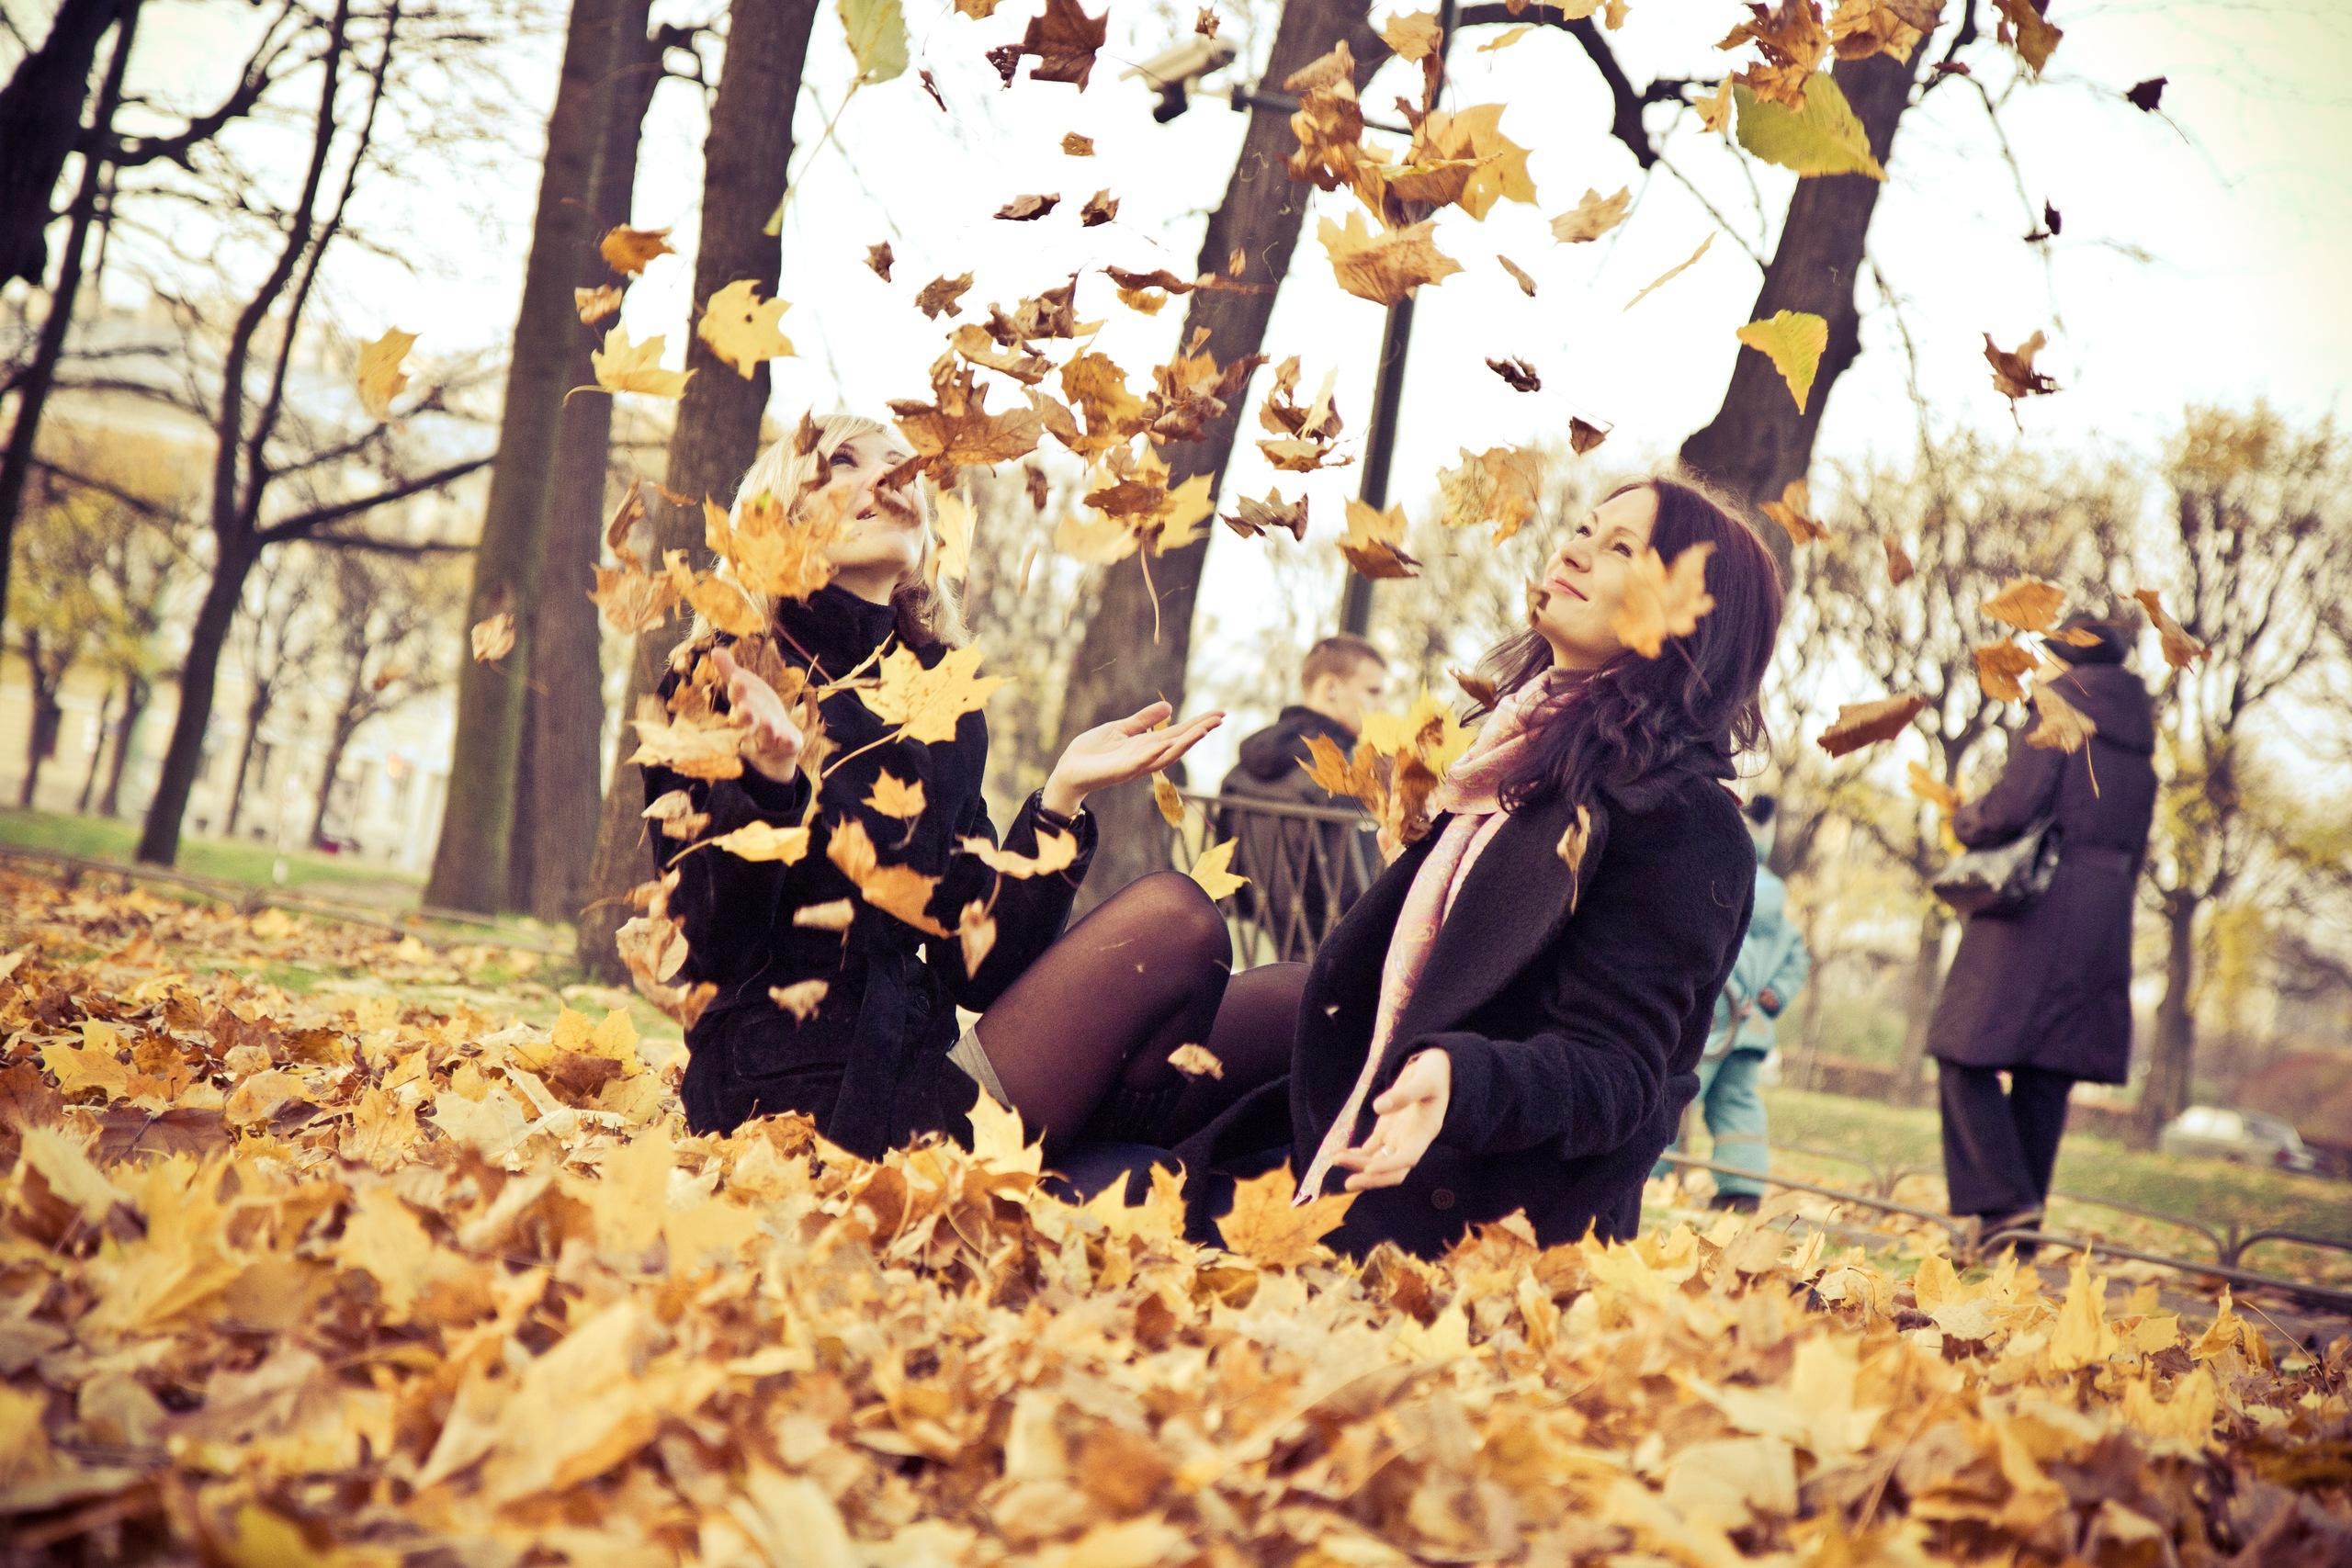 осенняя прогулка в Летнем саду . Краски осени